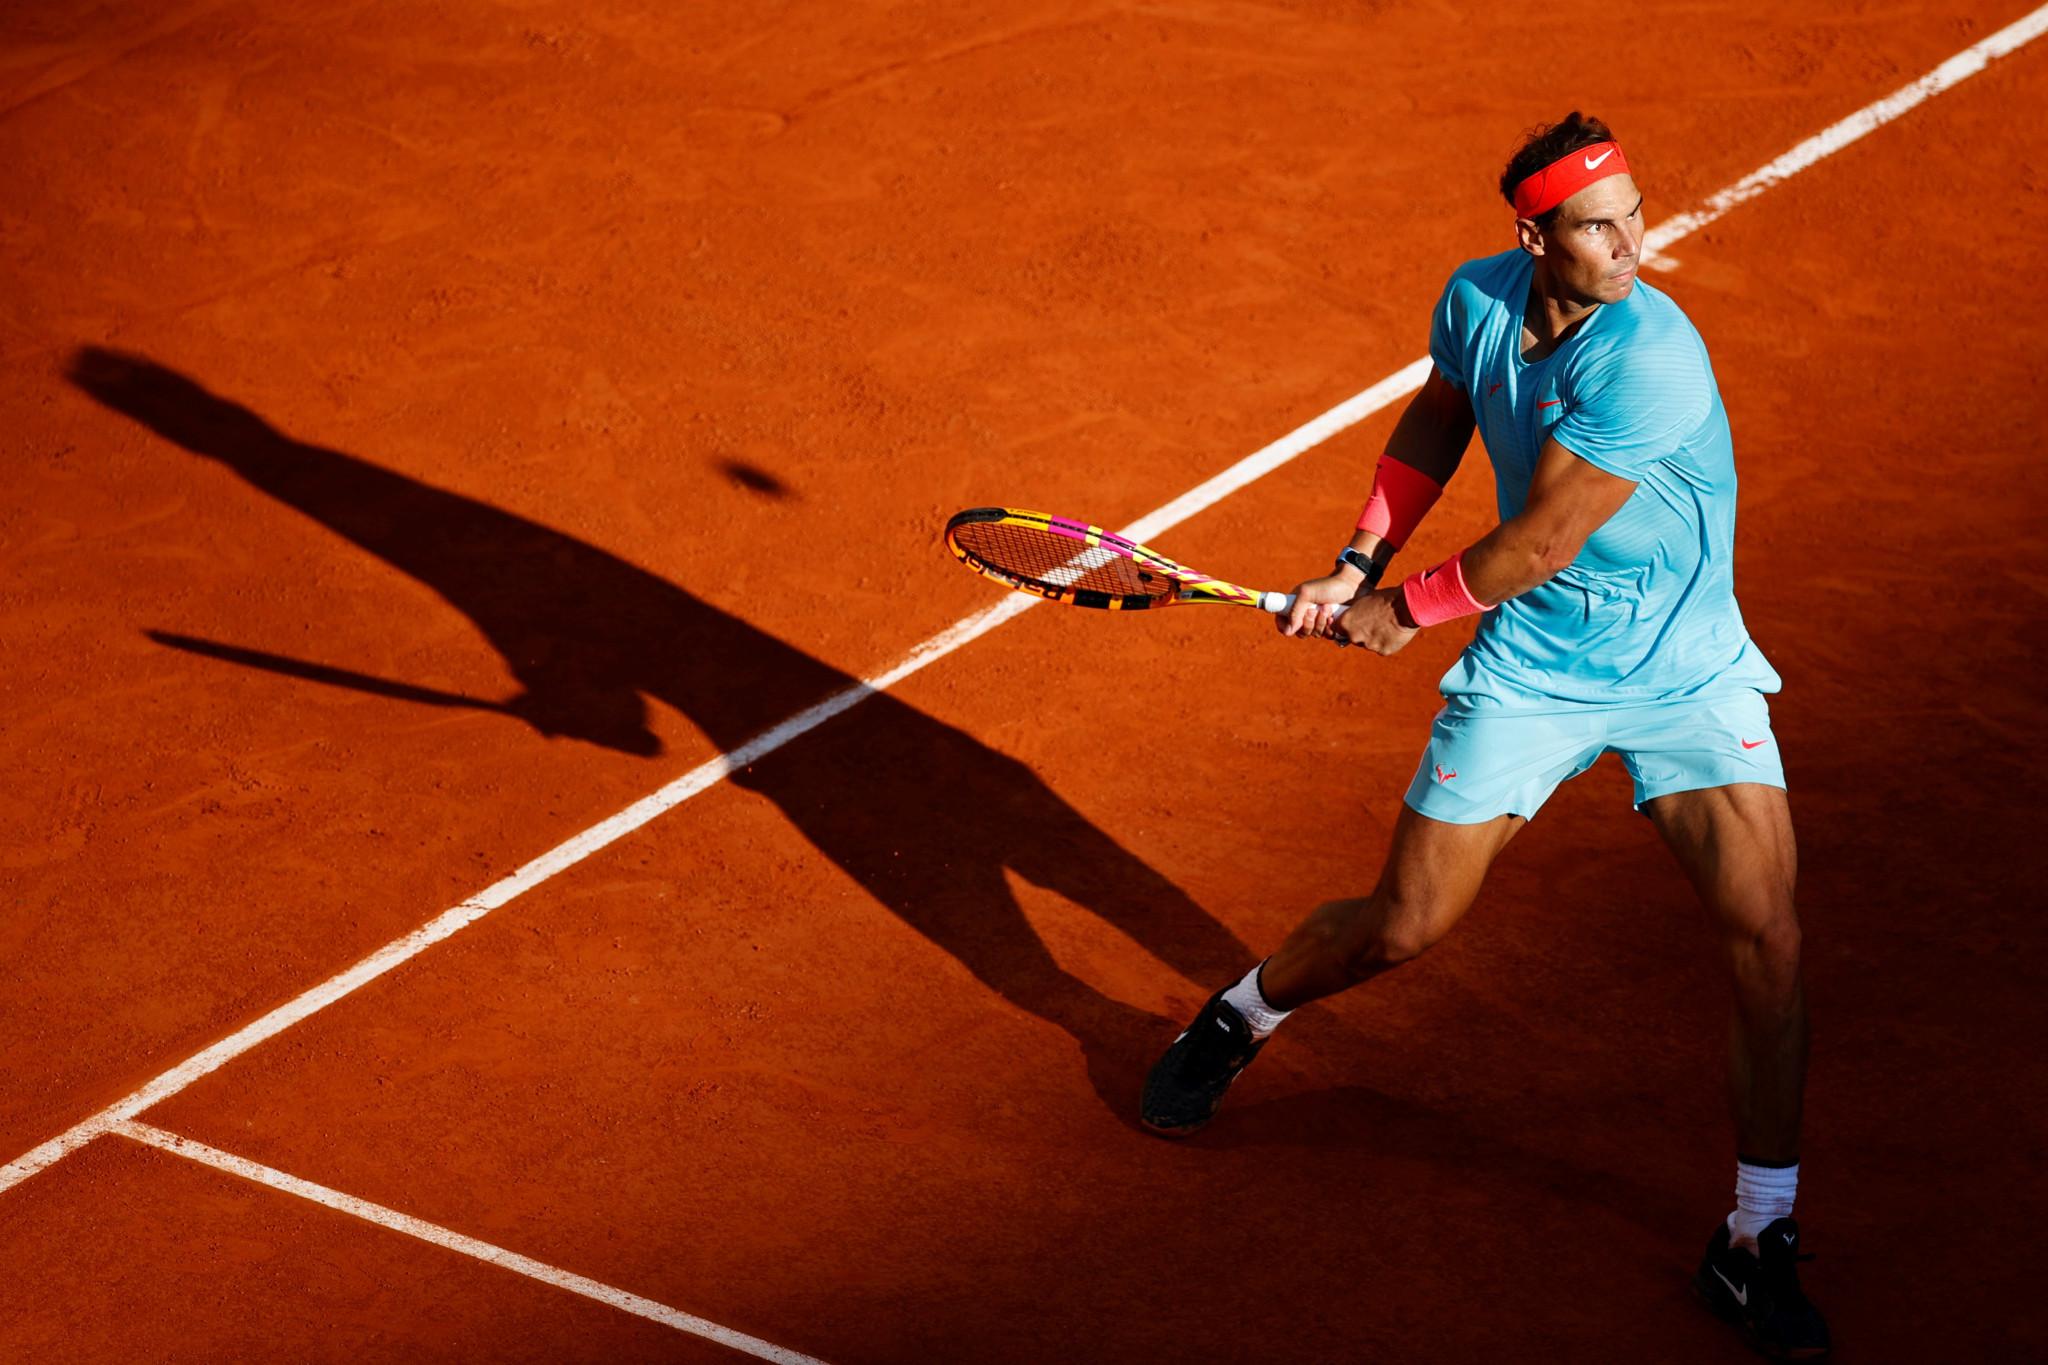 Djokovic stays unbeaten in 2020 to set up French Open final versus Nadal